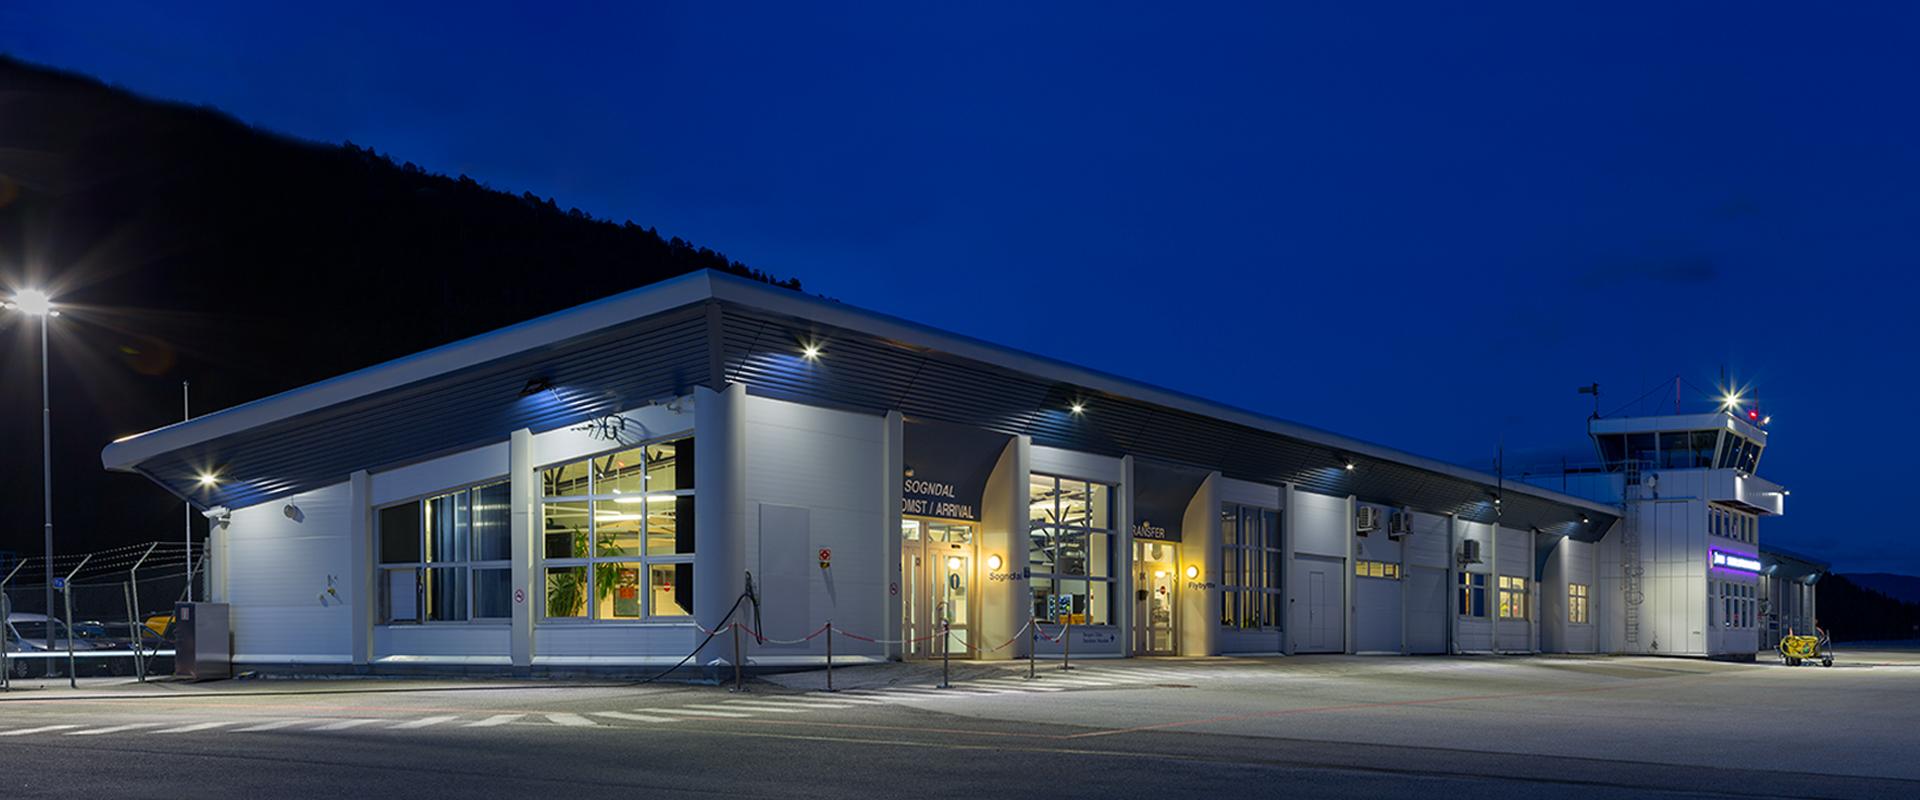 Fari LED aeroporti